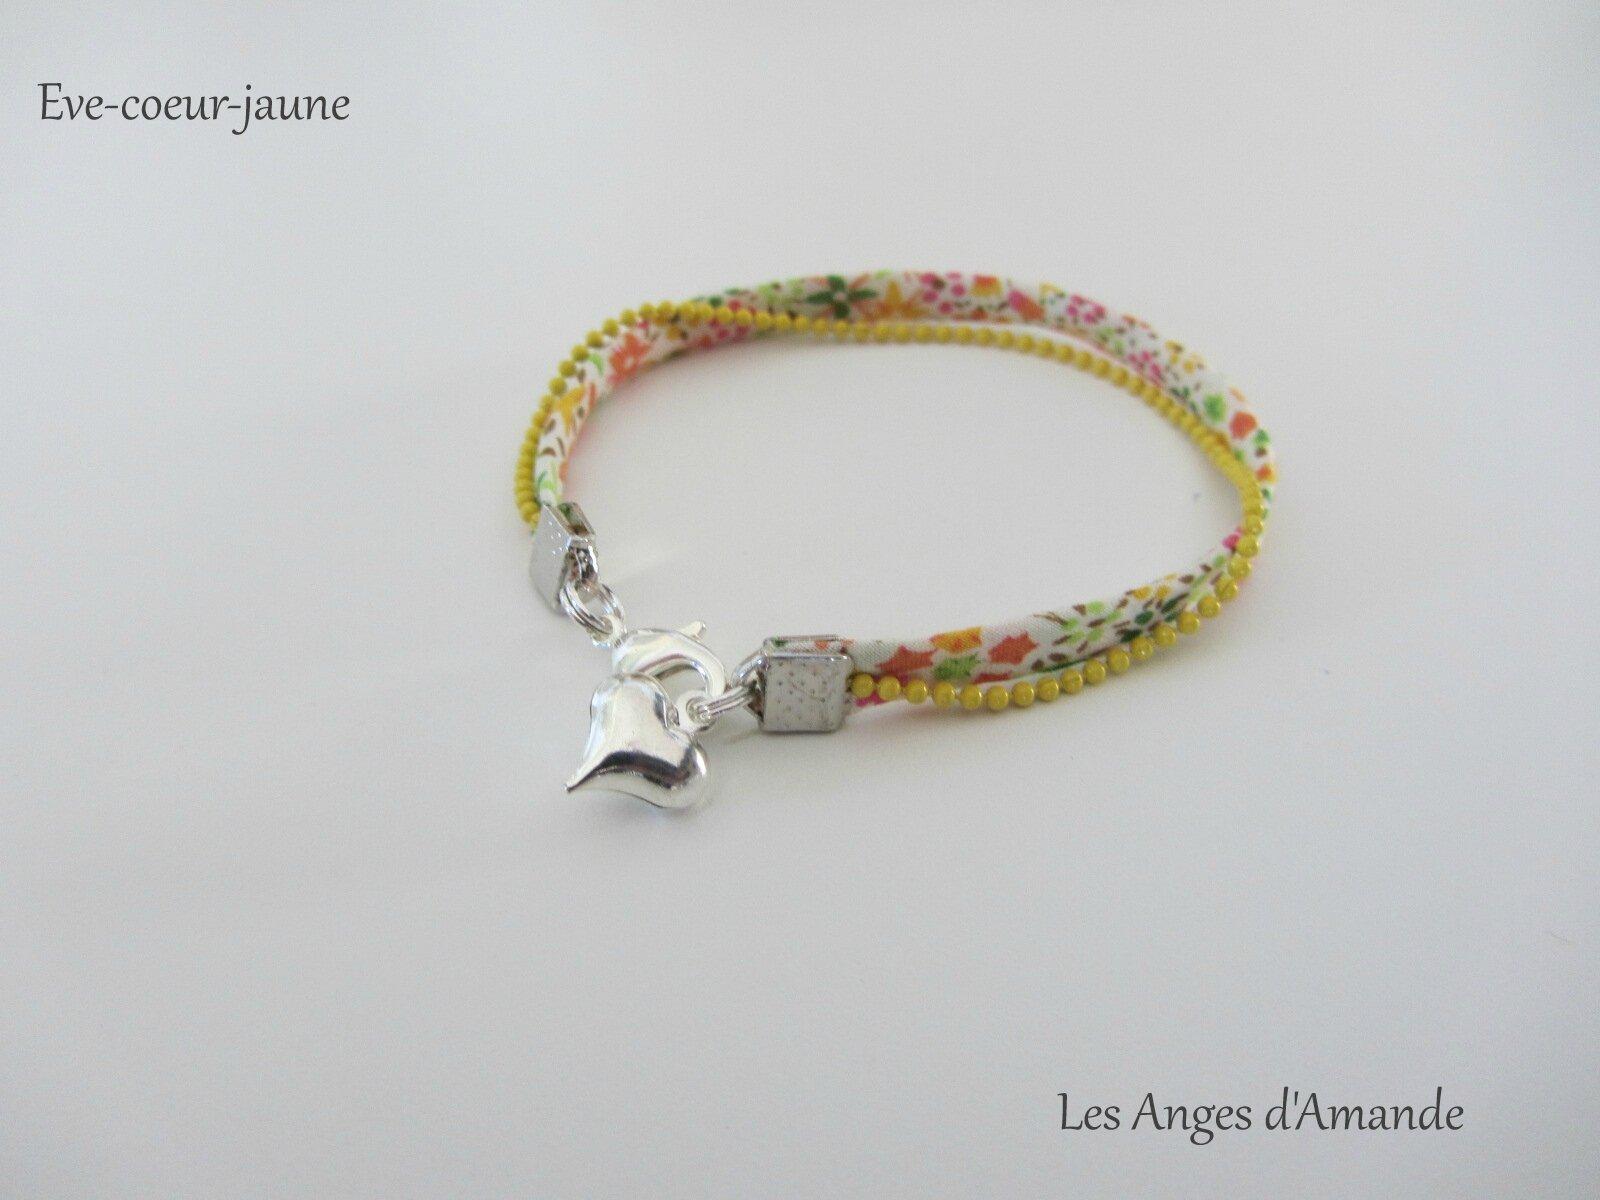 bracelet Eve-coeur-jaune